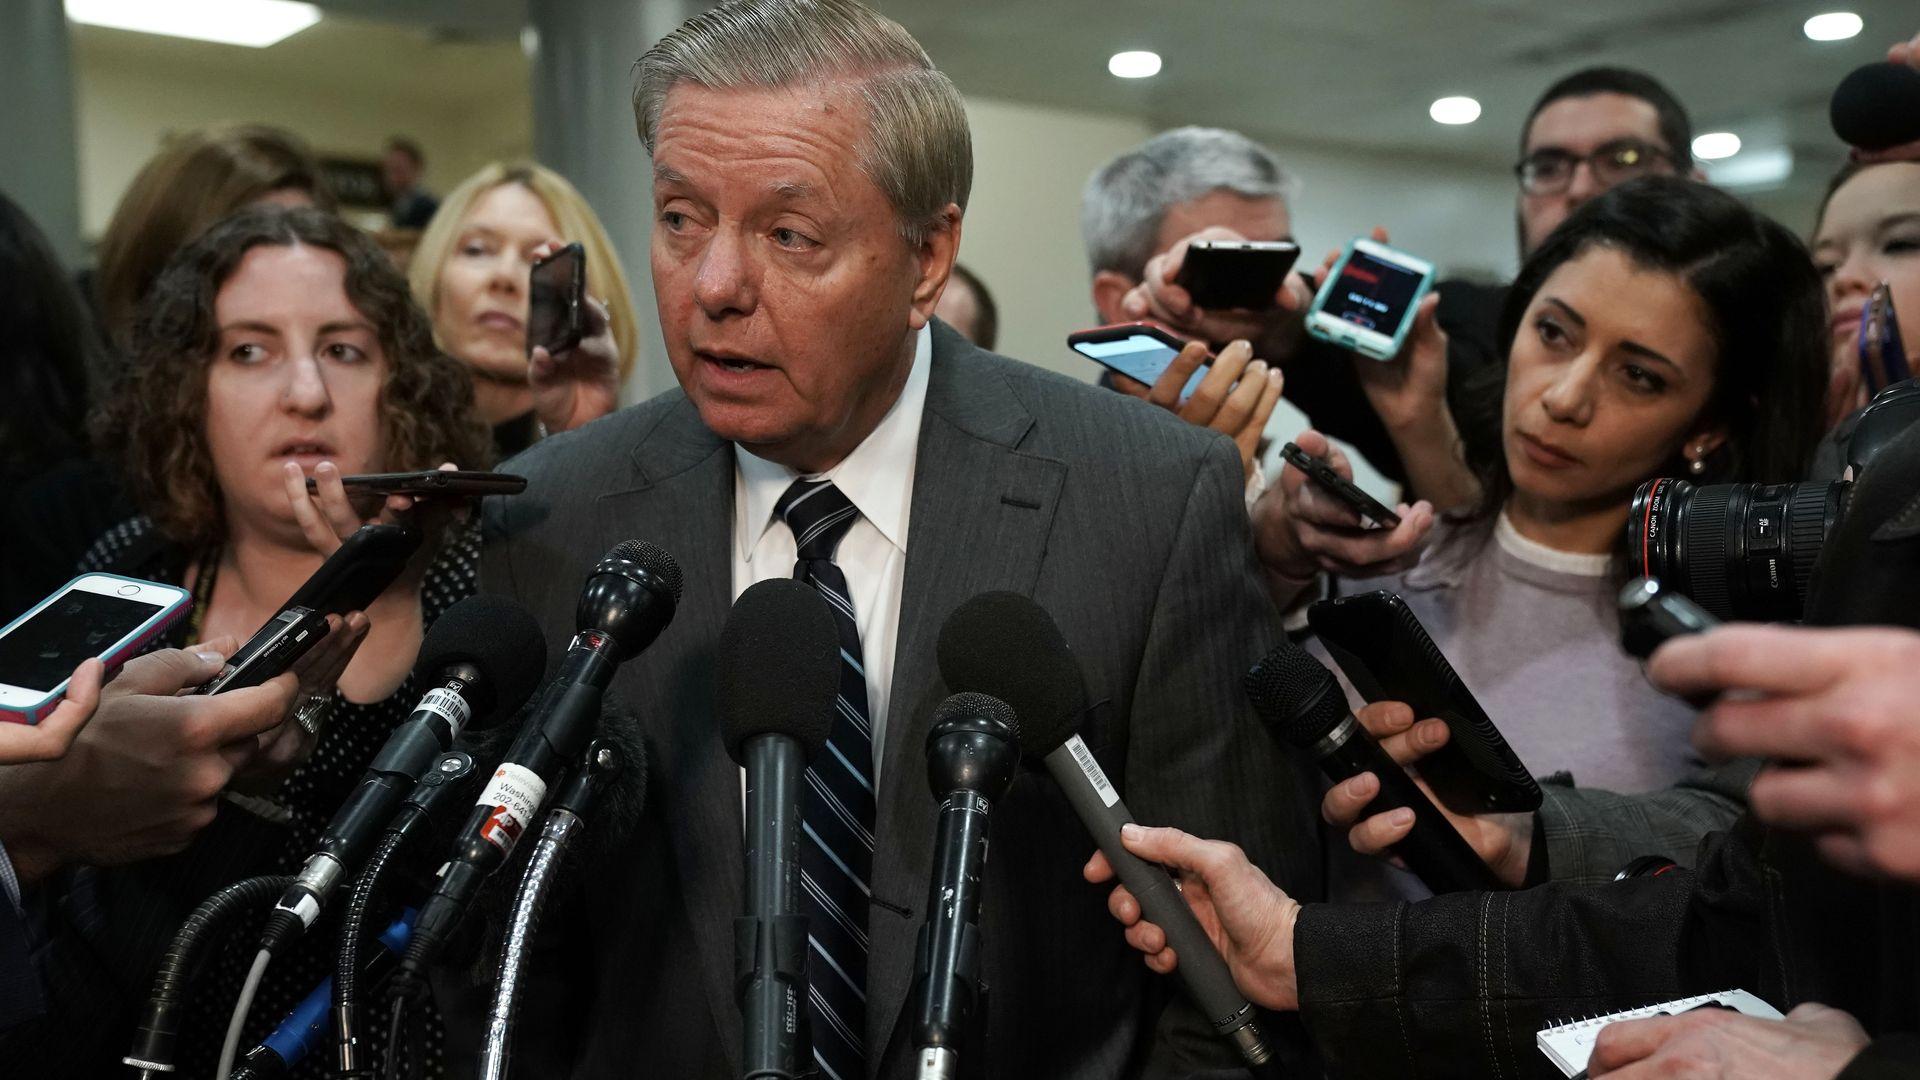 Senator Lindsey Graham surrounded by the media.